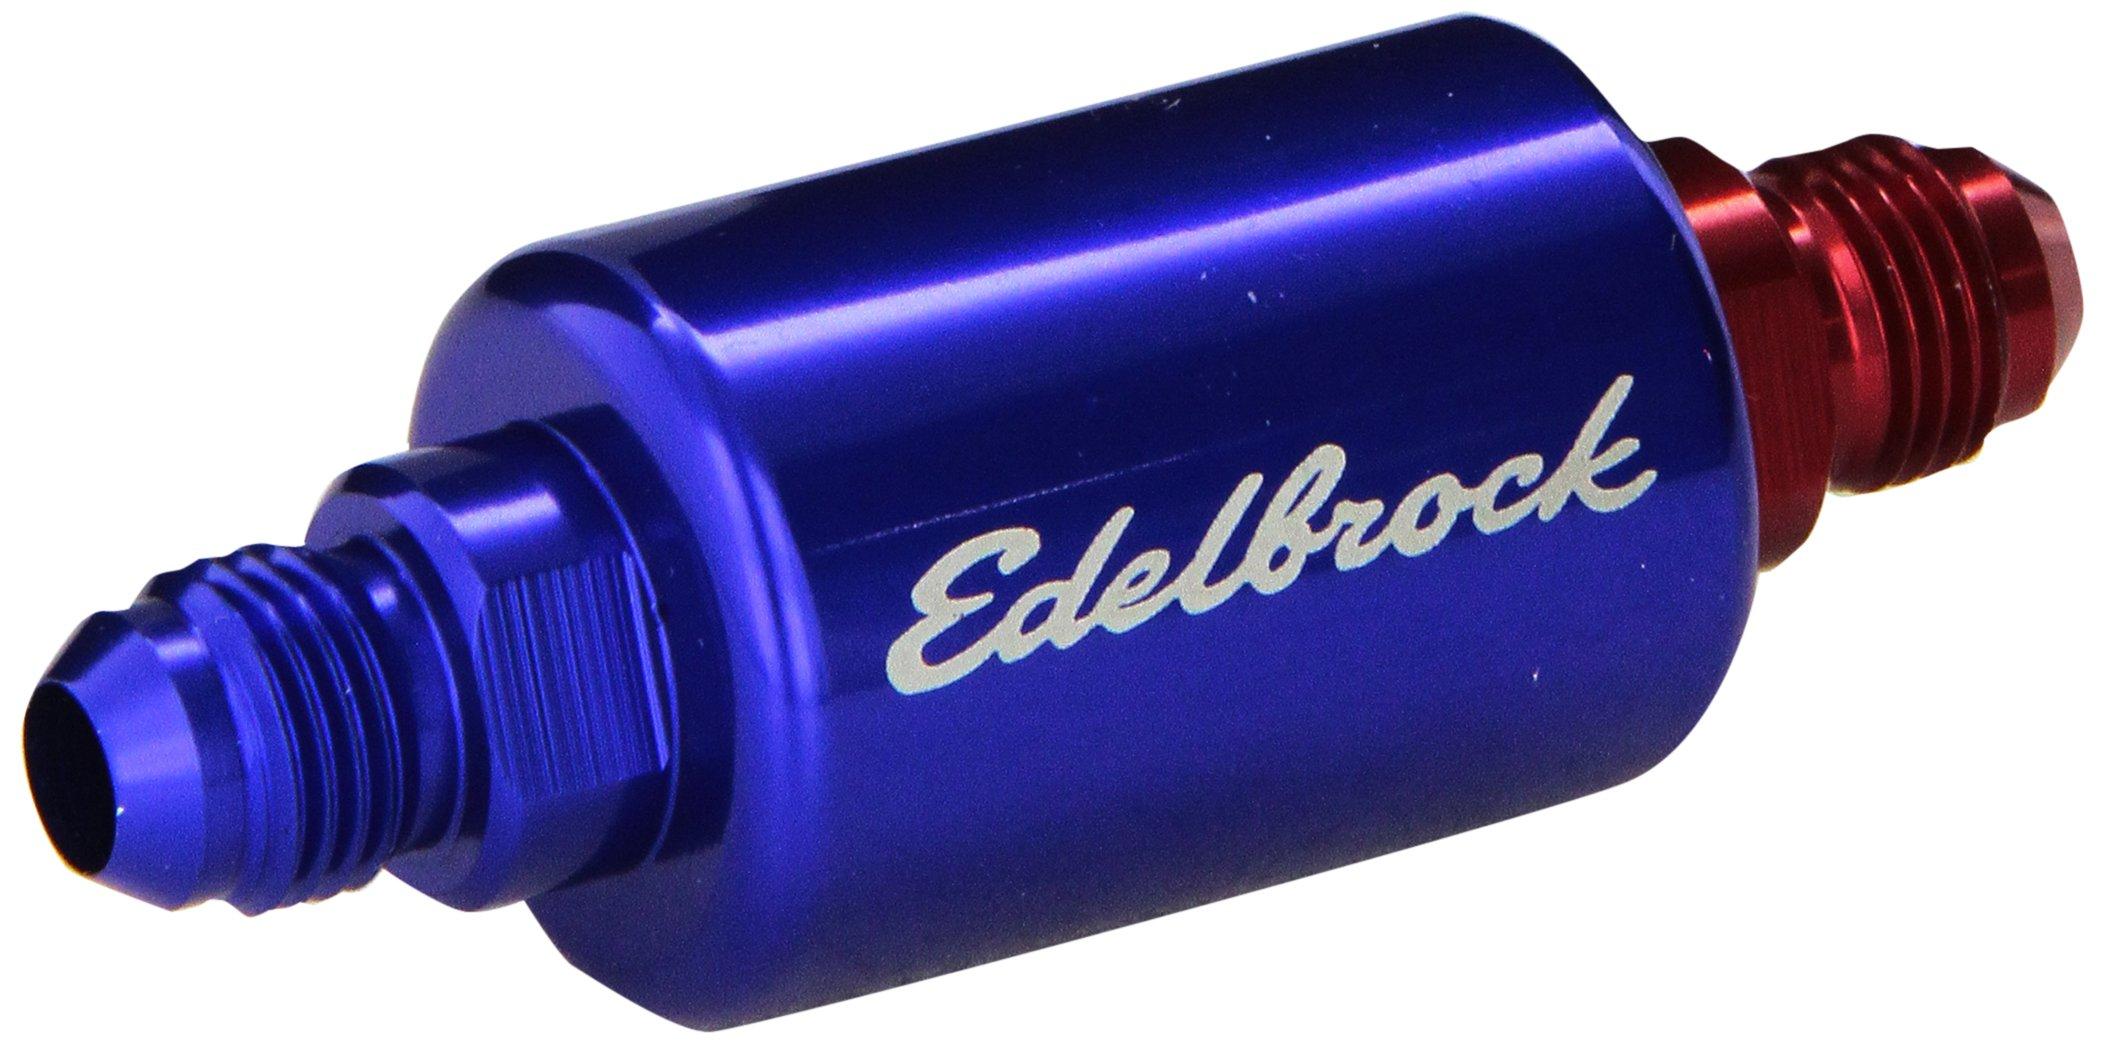 Cheap Edelbrock Fuel Pump Find Deals On Line At 1721 Get Quotations 8130 Blue Anodized Aluminum Filter